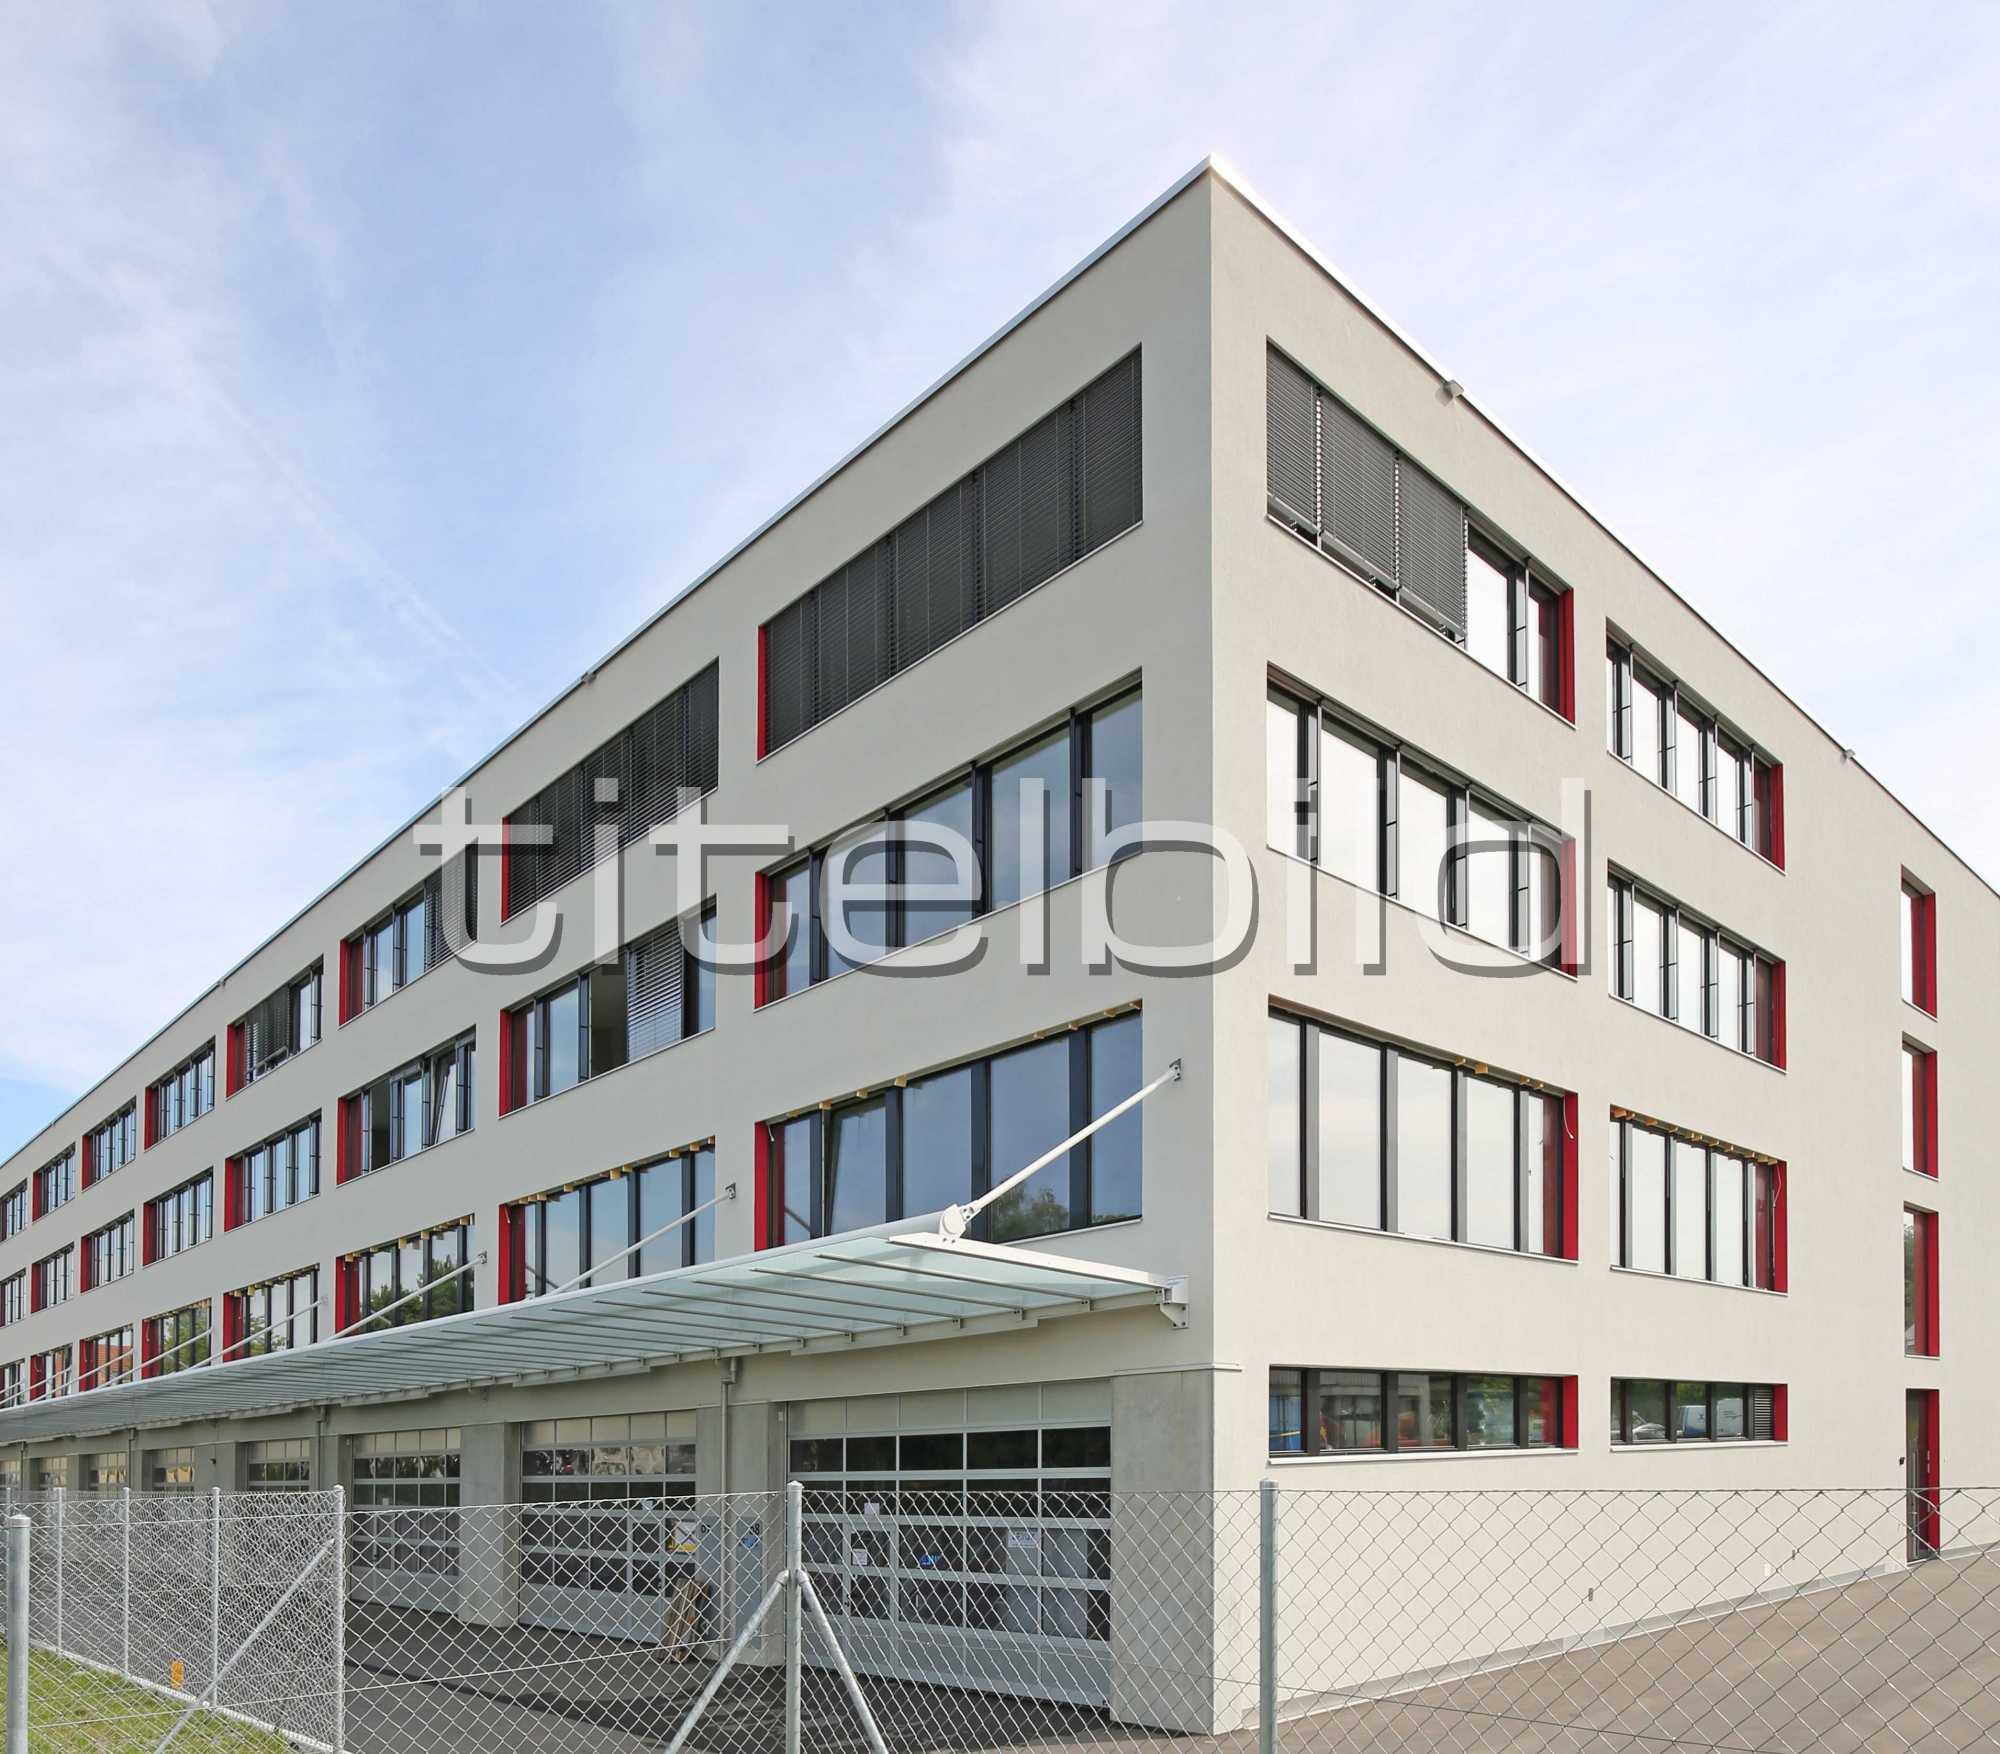 Projektbild-Nr. 1: Gewerbezentrum Dreispitz